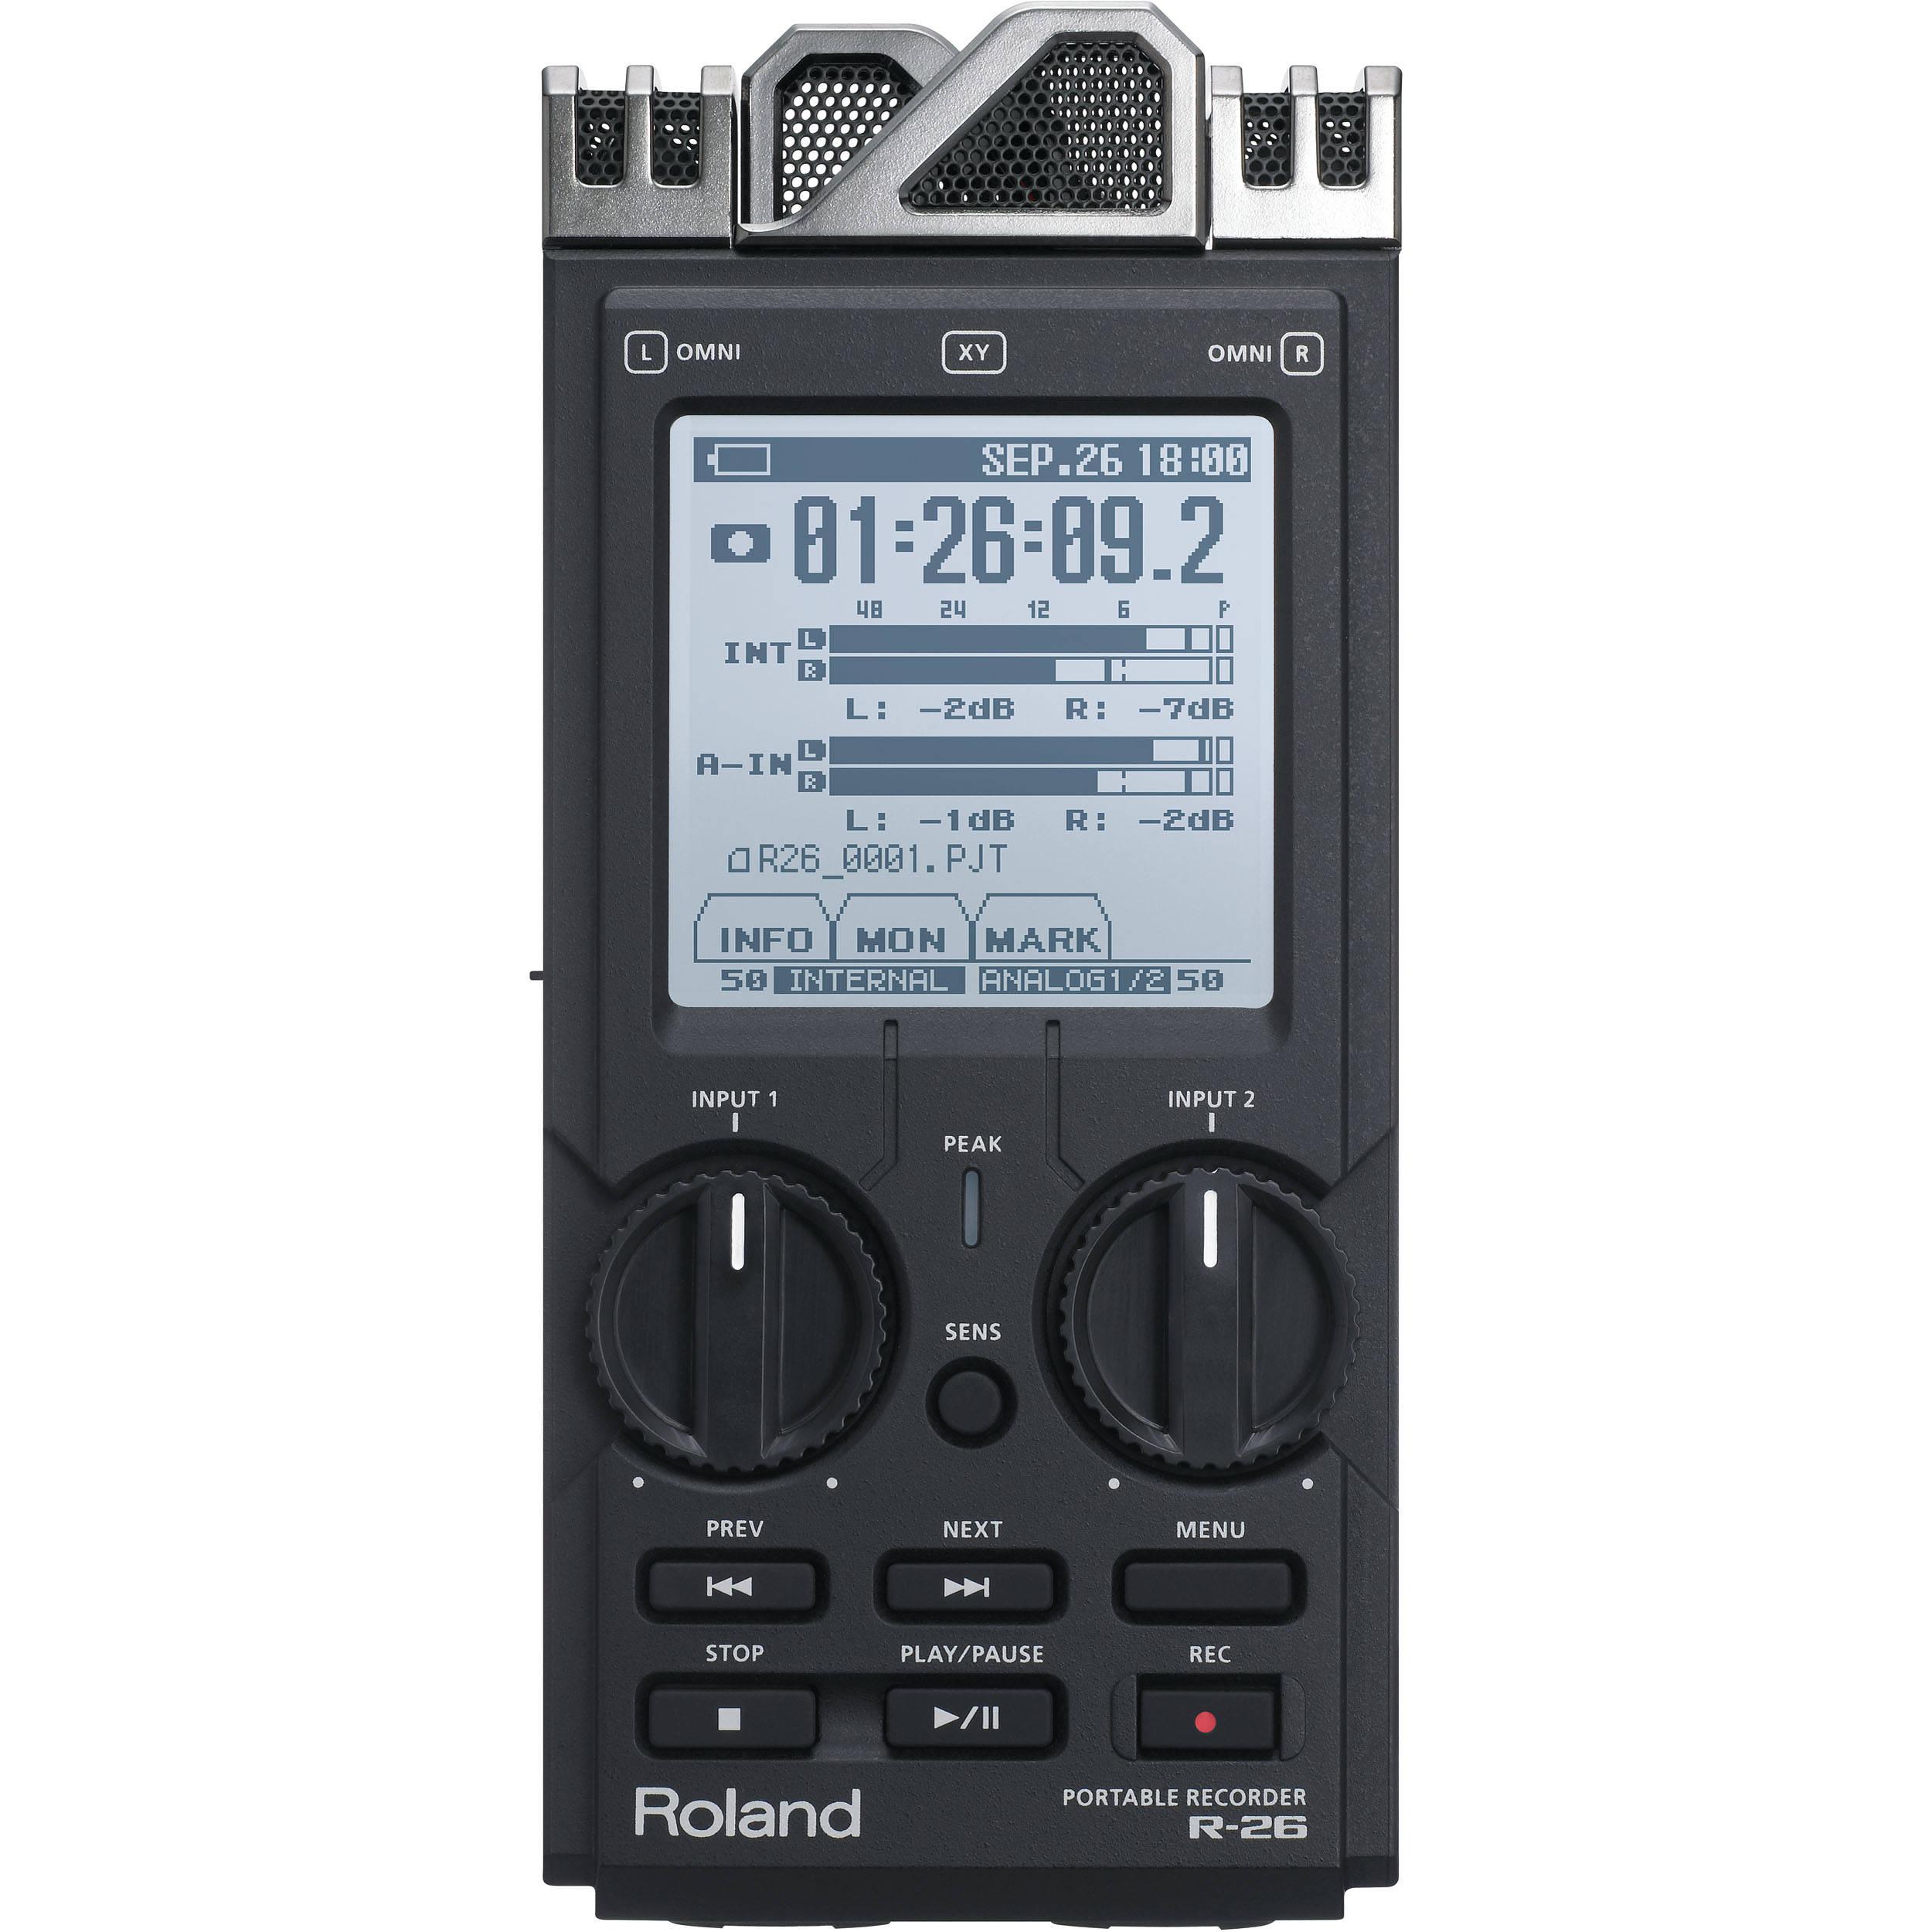 Best audio video recorder - video and audio surveillance